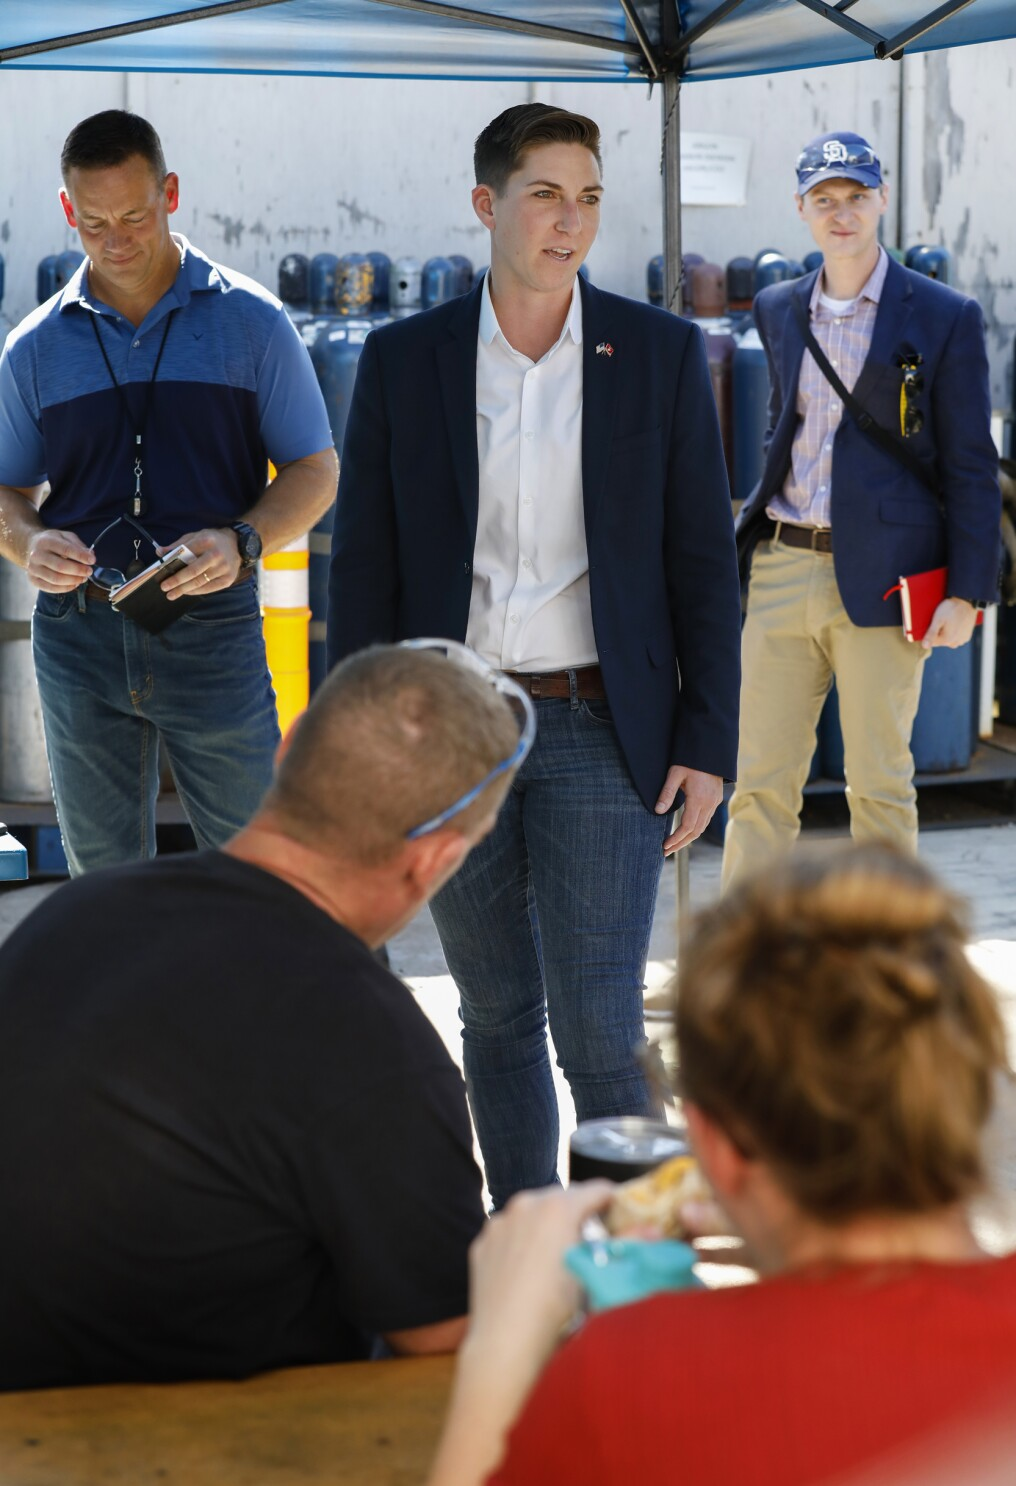 Goldbeck lands endorsement from Congressman and fellow Marine veteran Seth Moulton